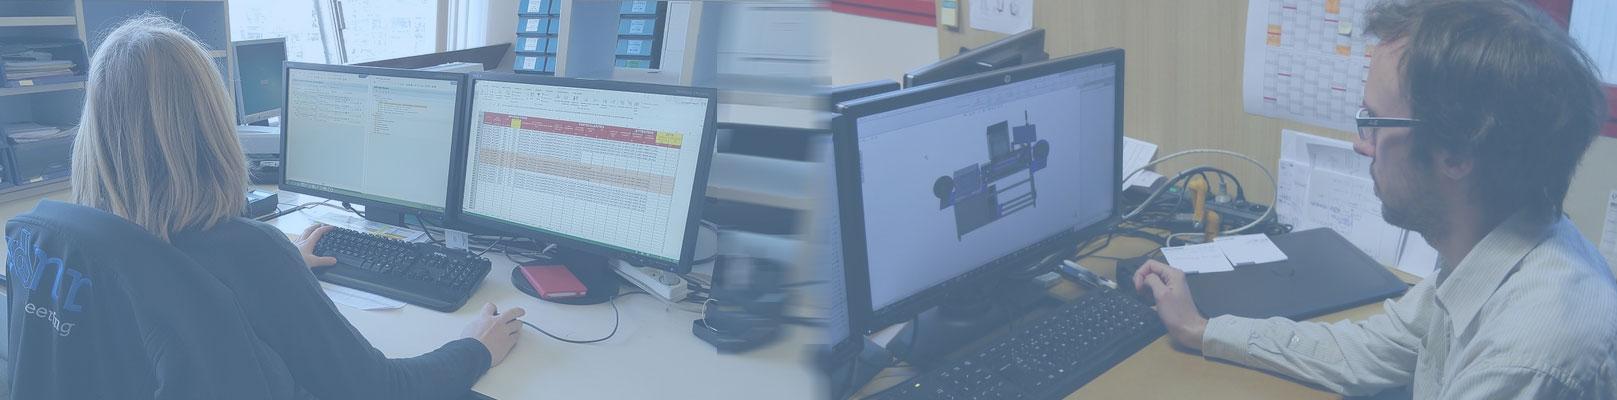 Prestation de Service - EDMR Engineering Rhône